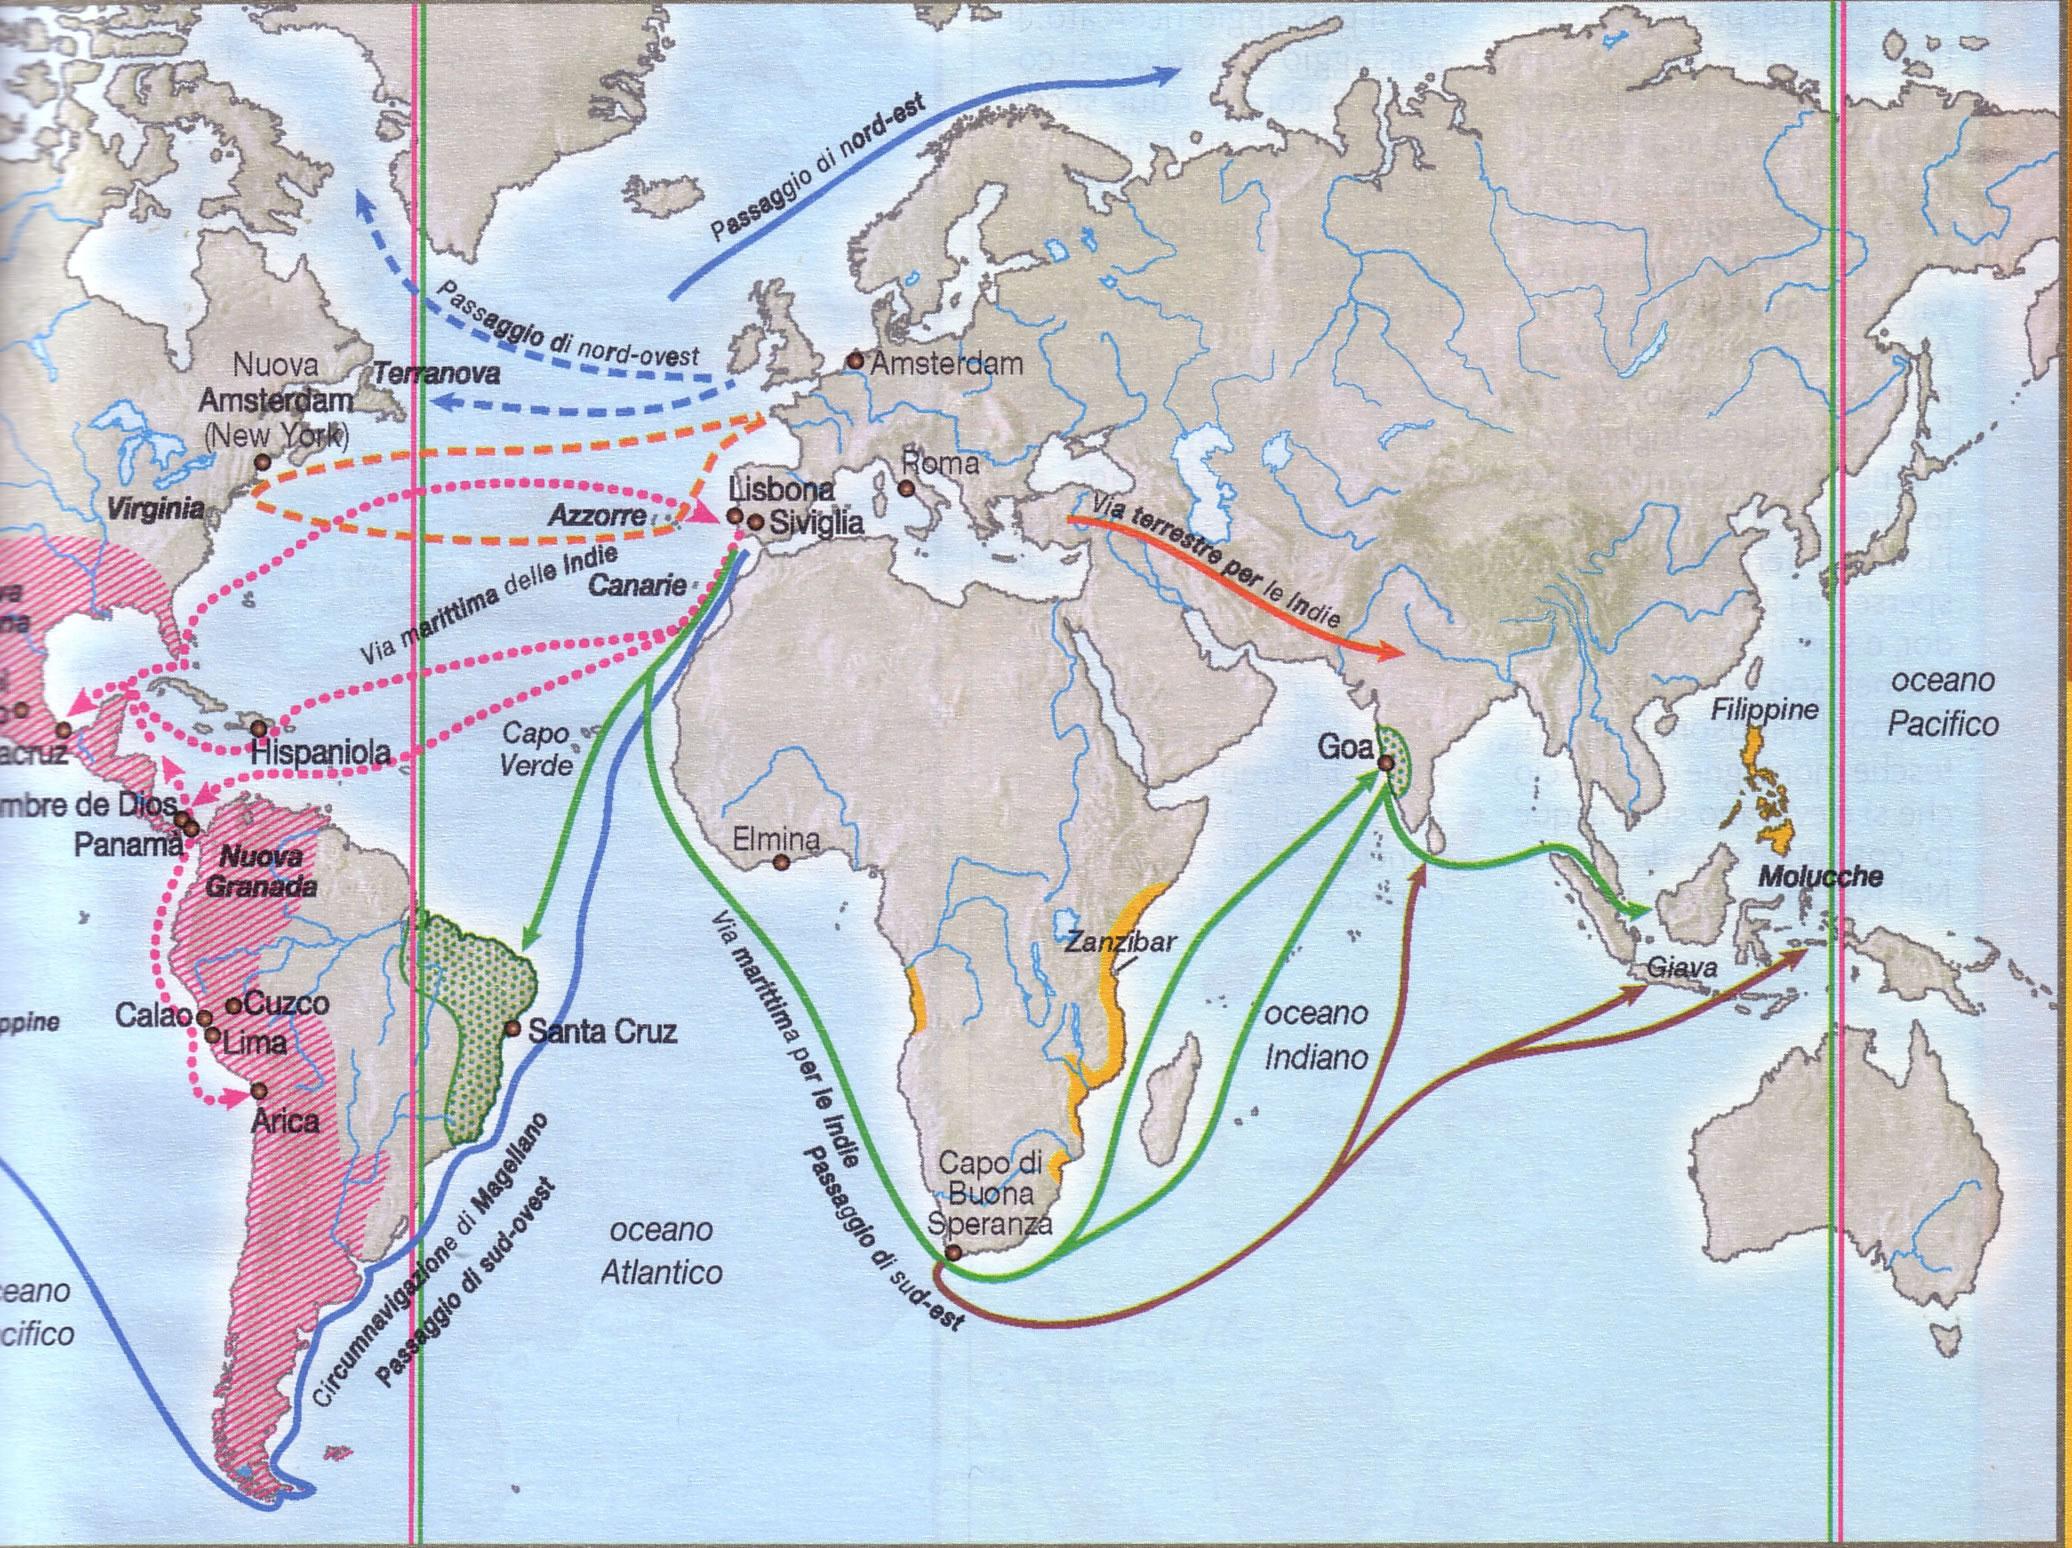 Colombo E I Viaggi Laceprof Materiali